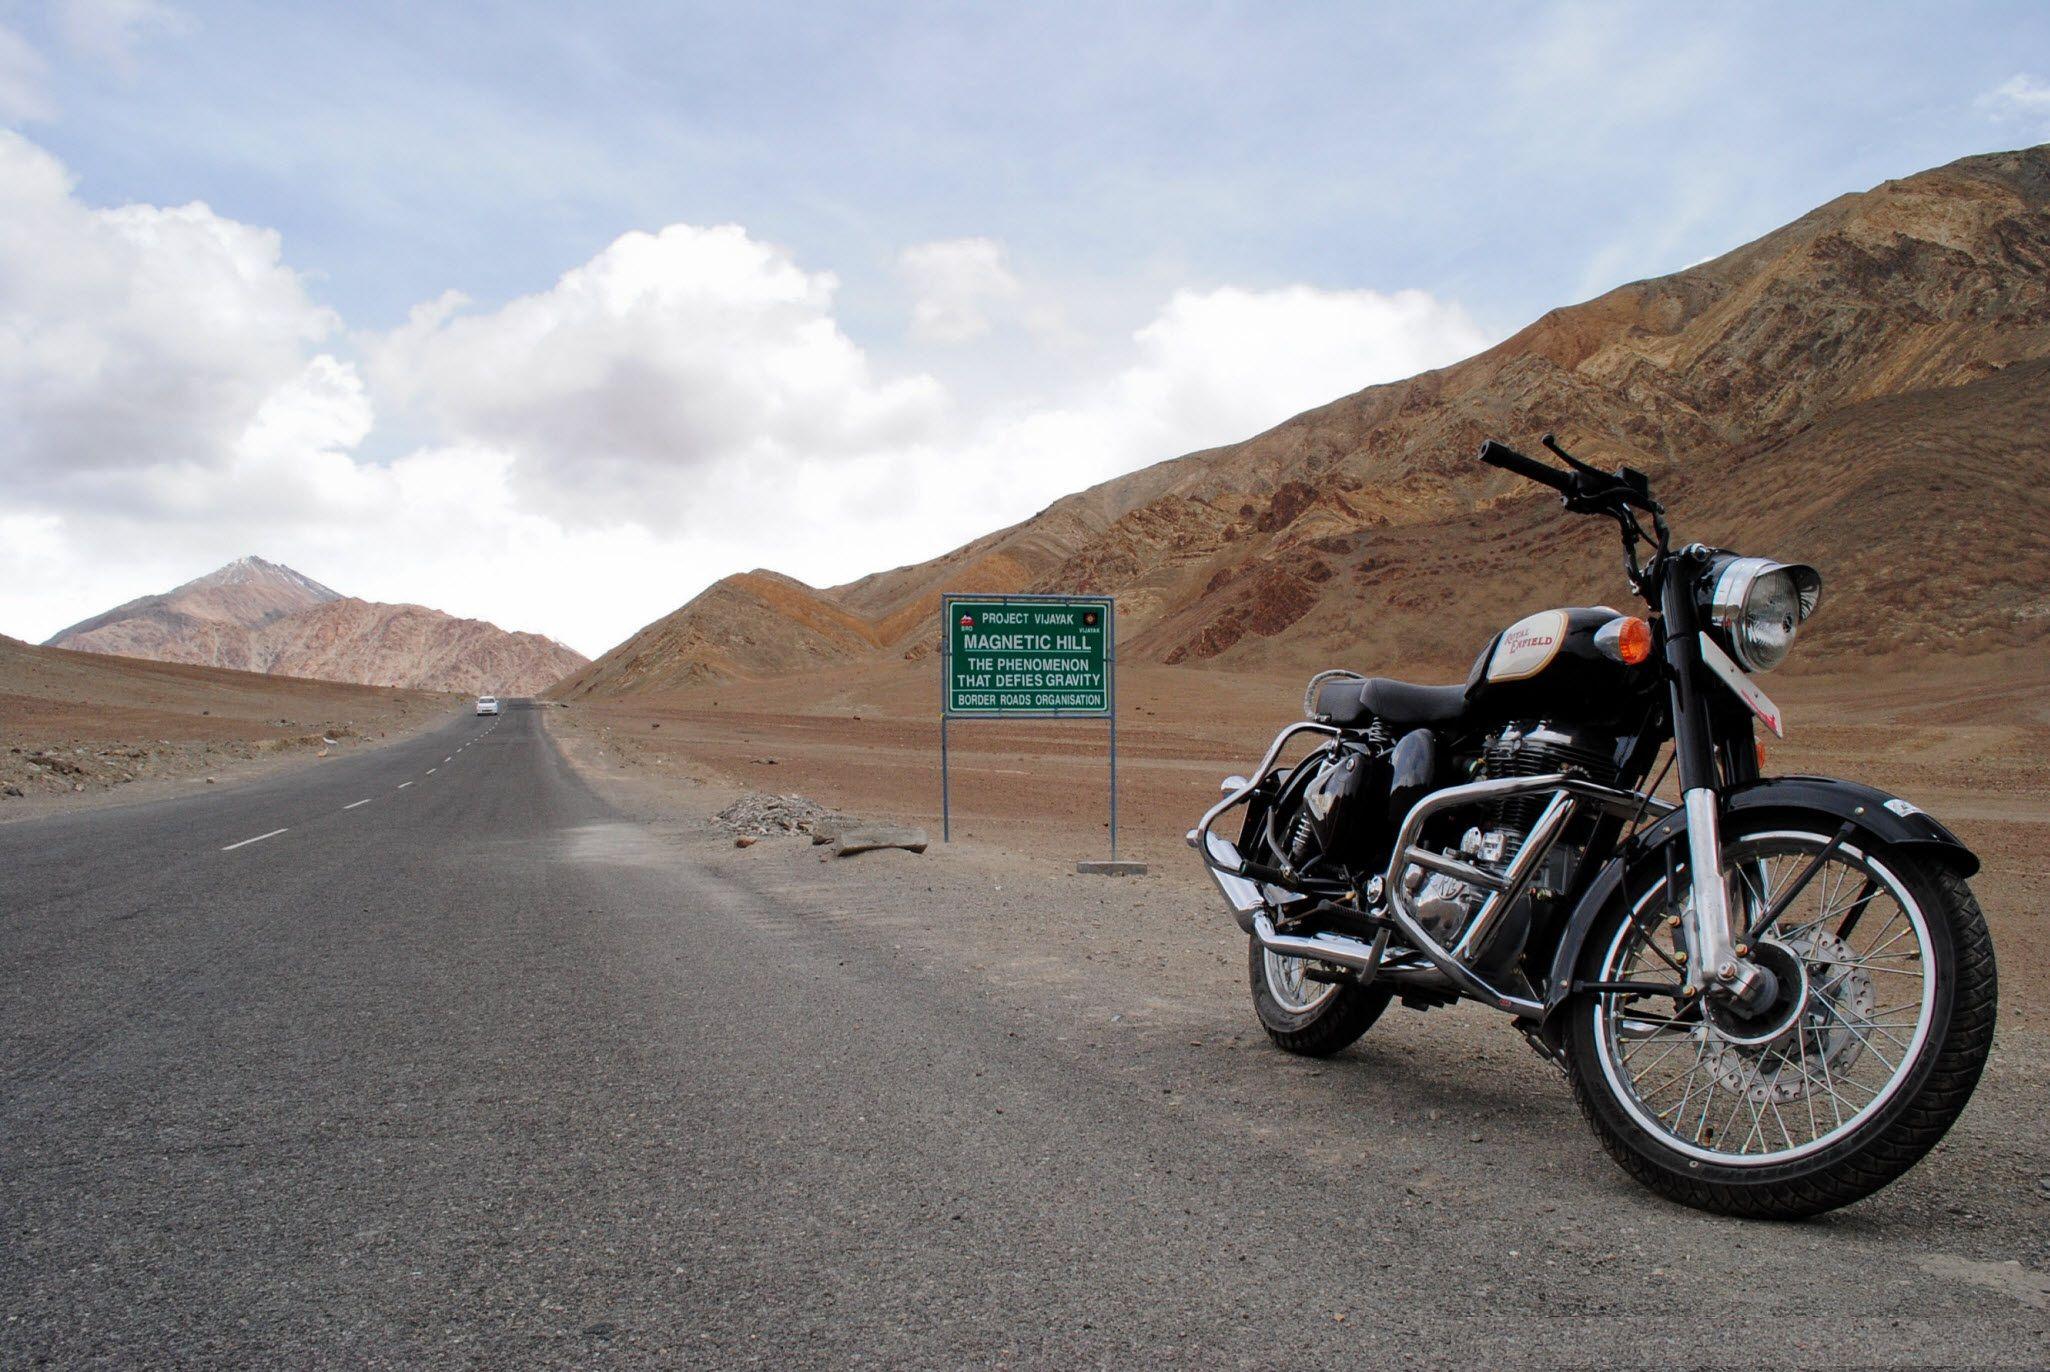 Rental Bikes For Ladakh Bike Tours Sscaravantravels Travel